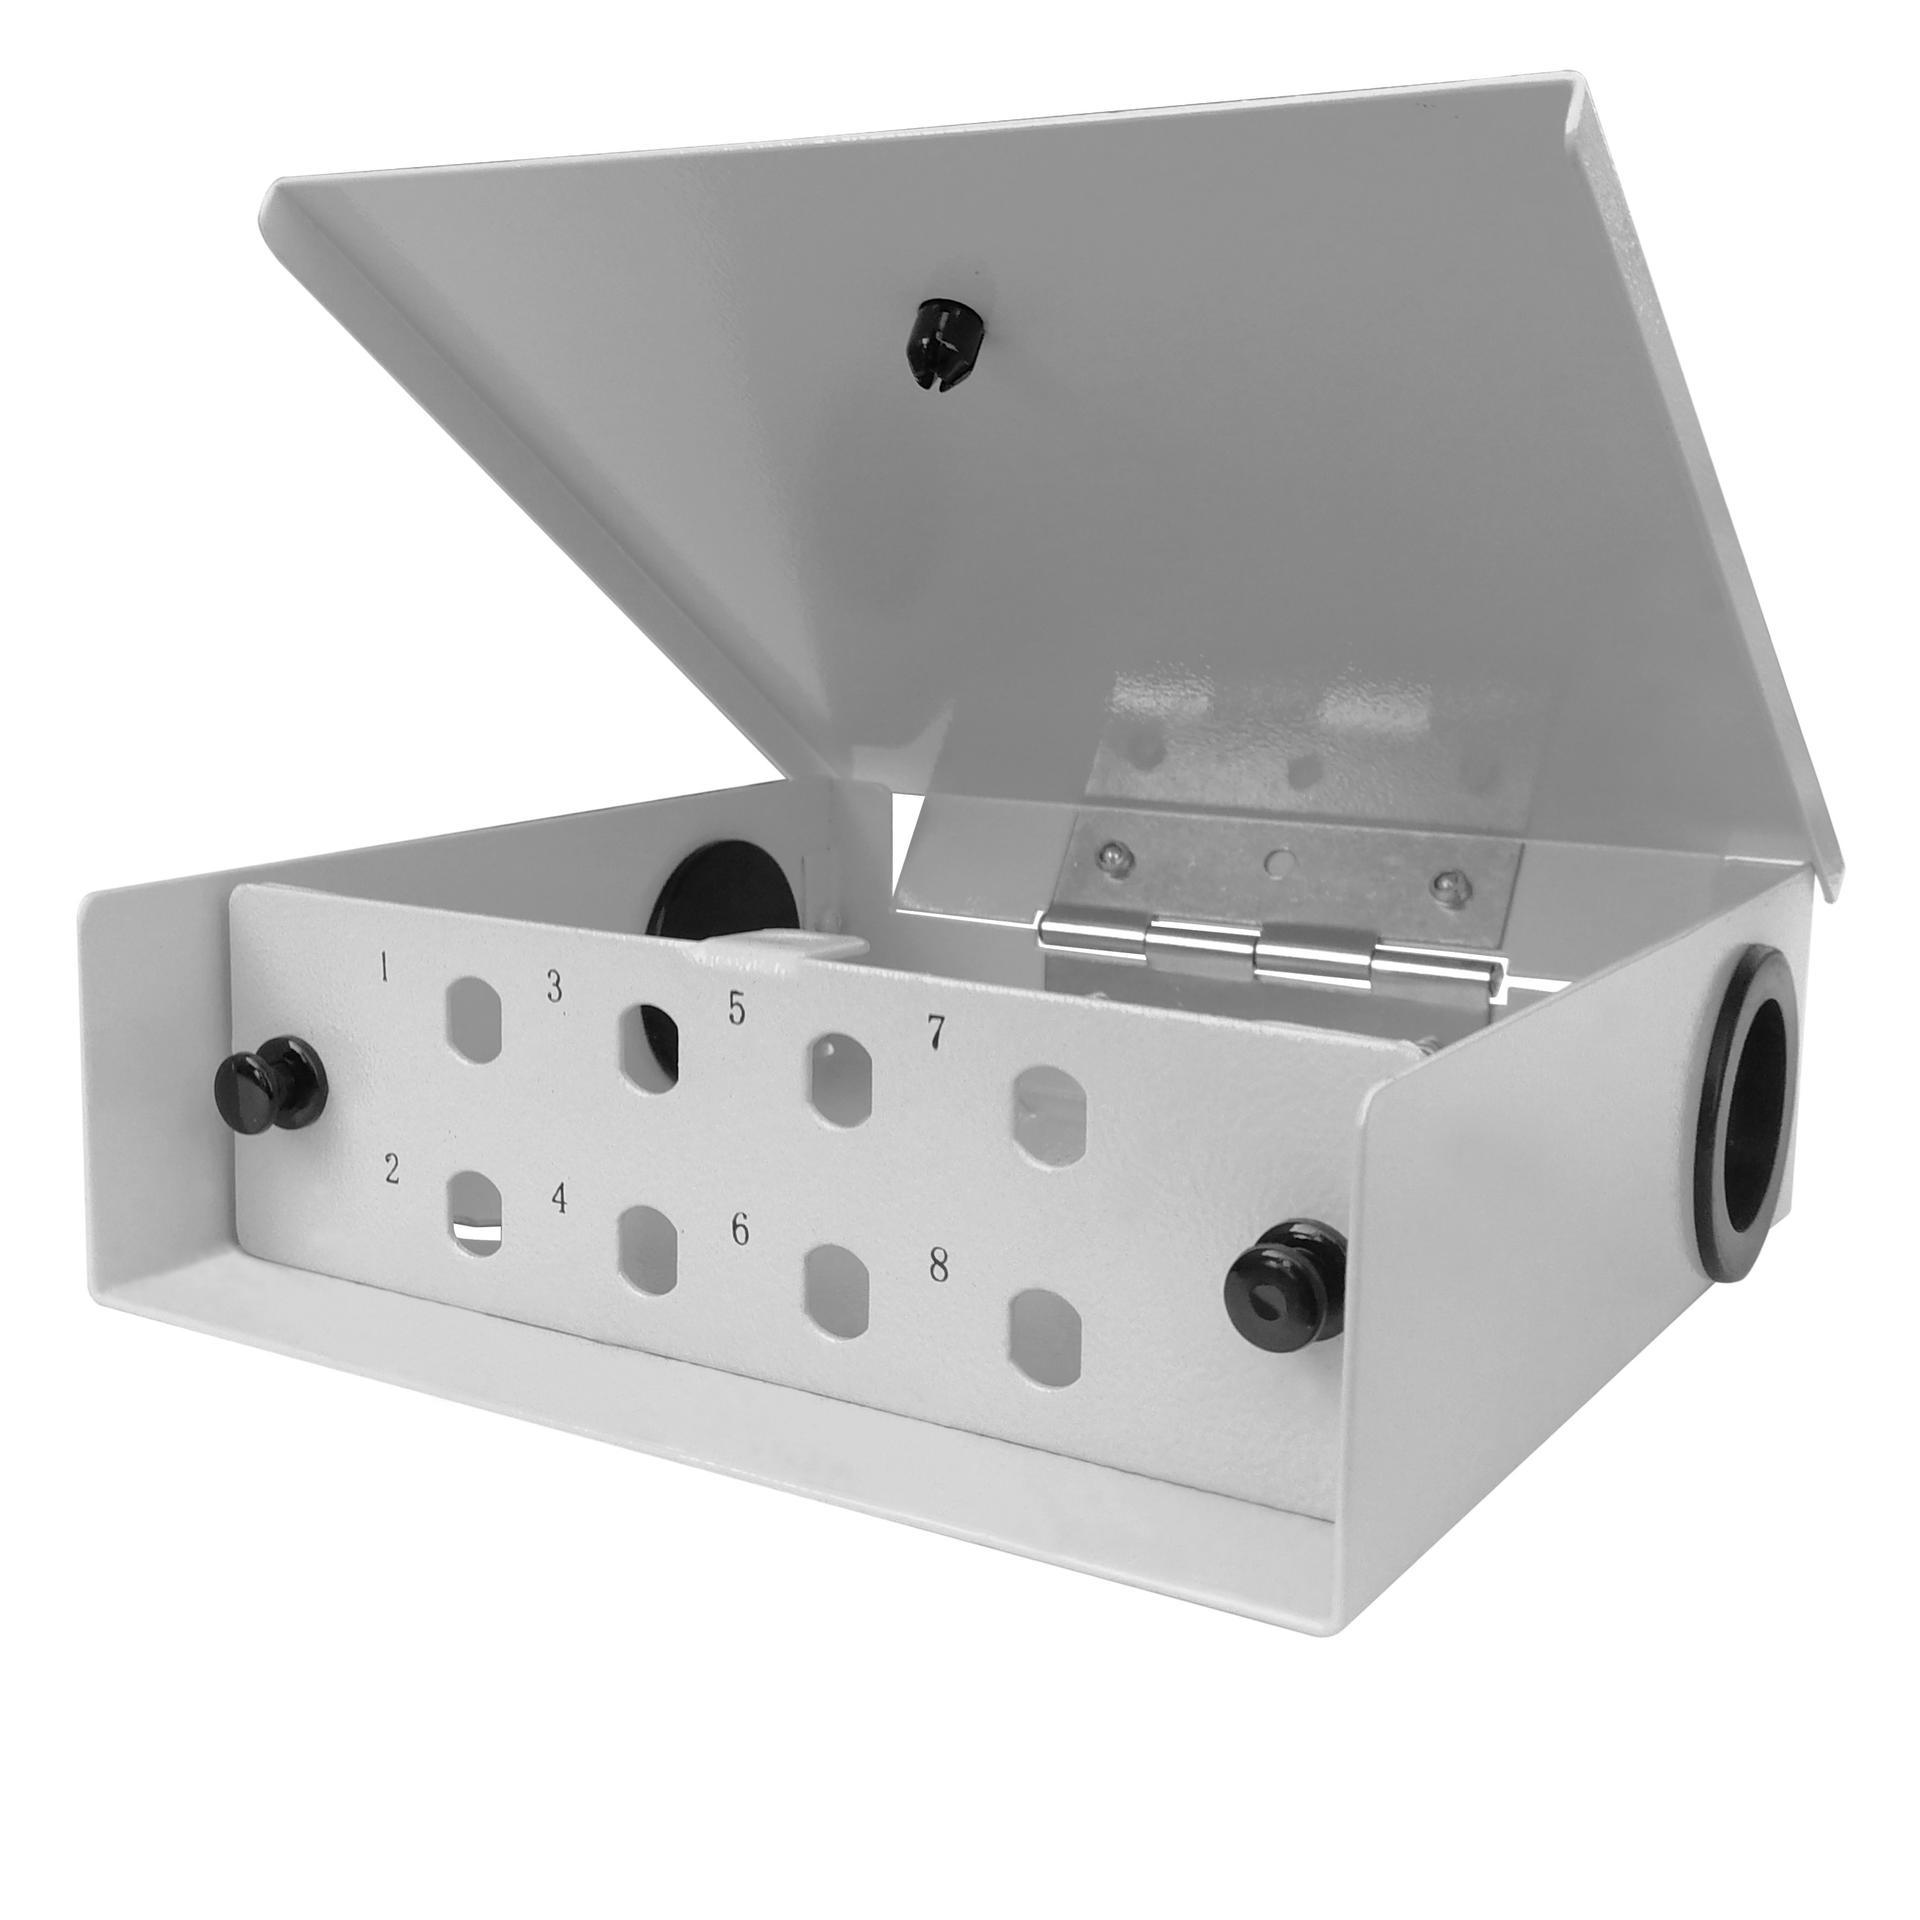 8 Port WODF Fiber Optic Distribution Box, ST Simplex